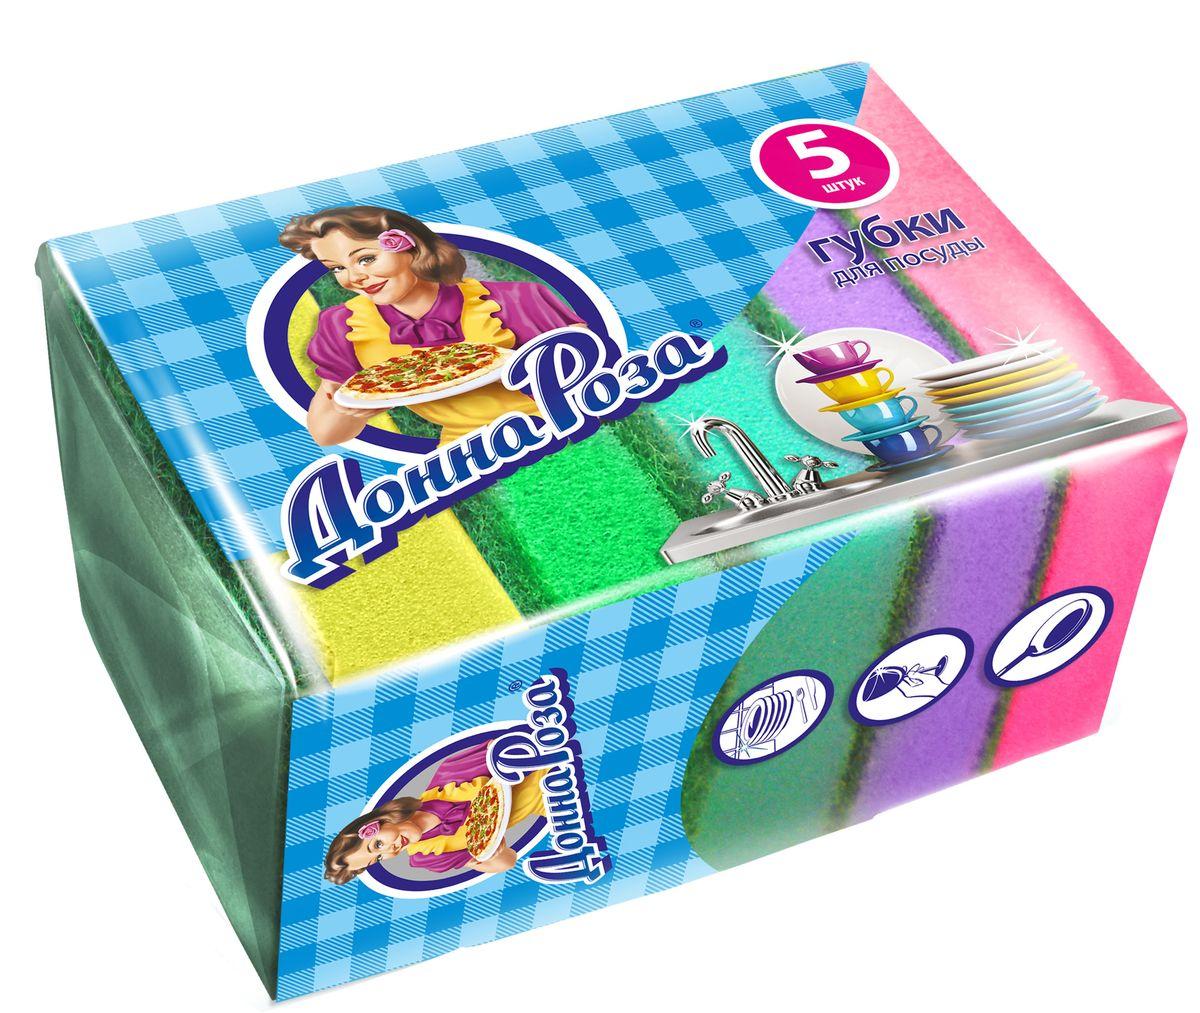 Губка для мытья посуды Донна Роза Роза, 5 шт салфетка для уборки донна роза универсальная цвет розовый